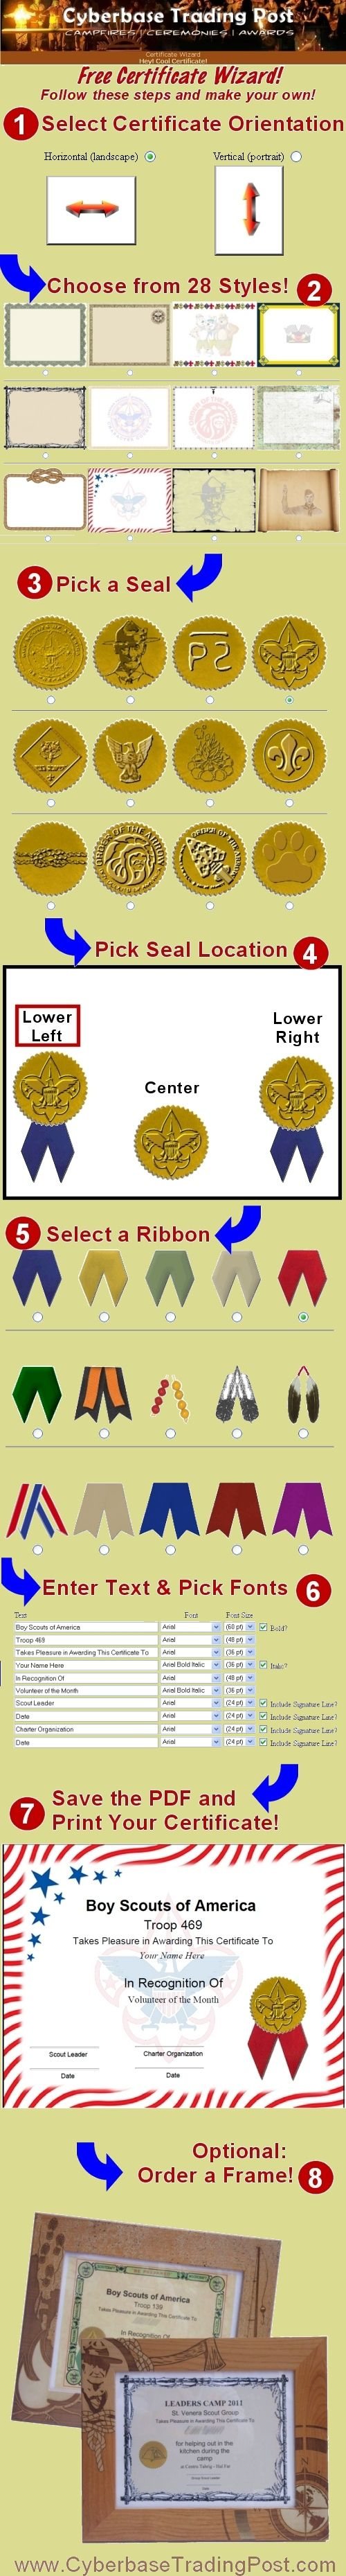 Eagle Scout Certificate Template